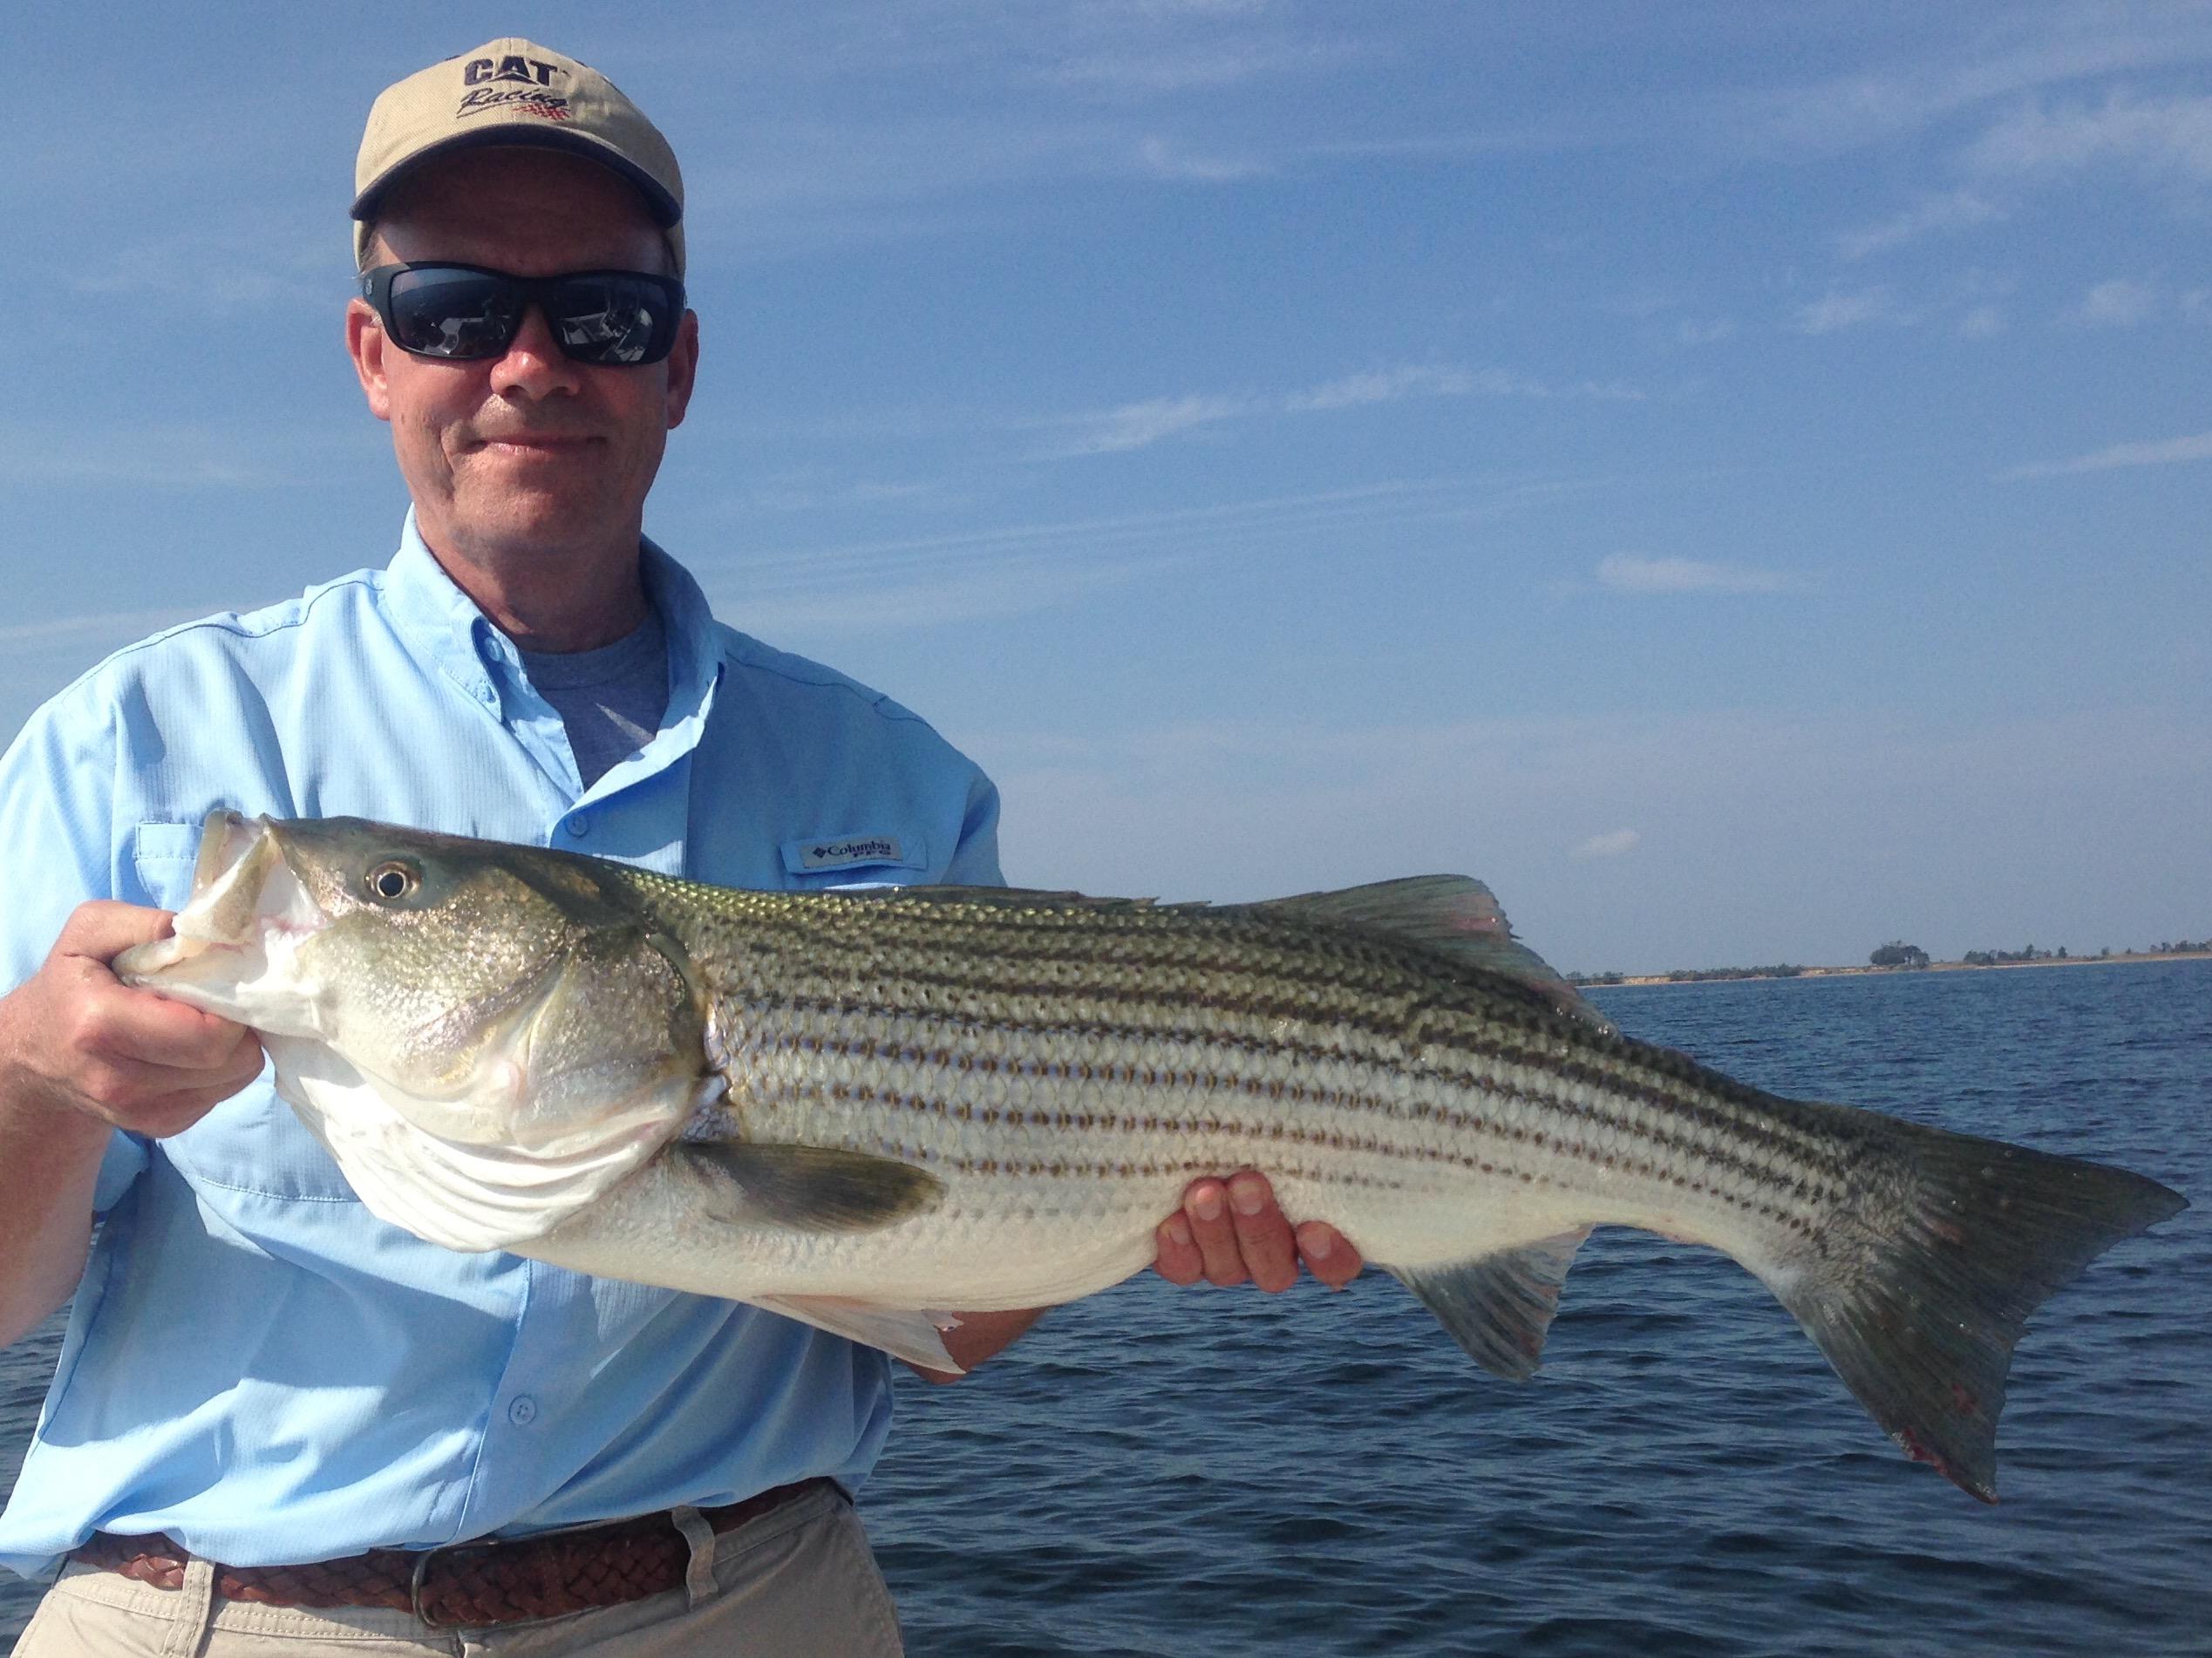 10 22 16 fly fish the chesapeake bay for Fishing chesapeake bay